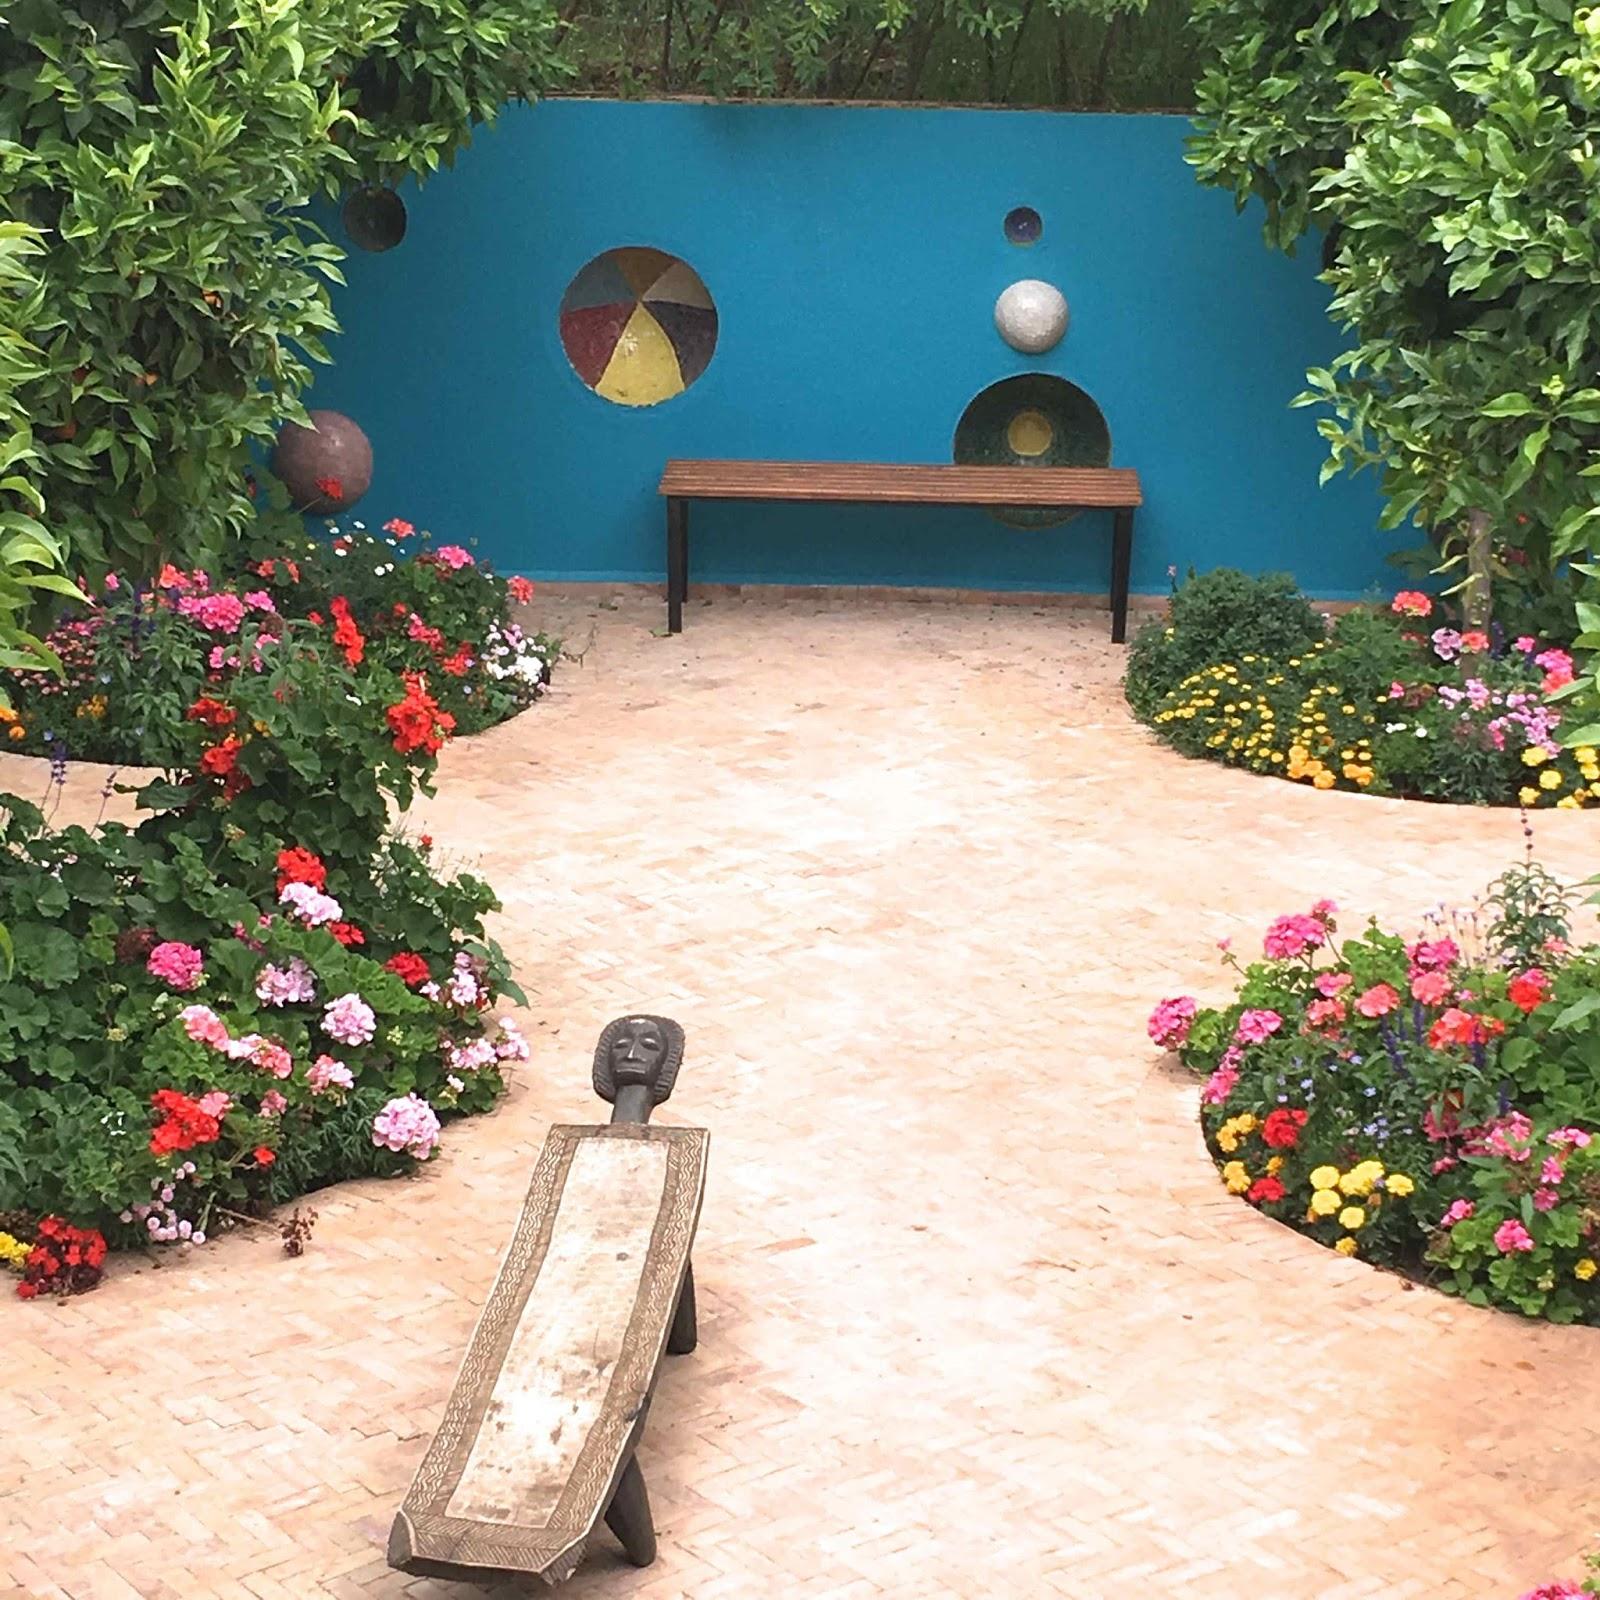 Marrakech, nature, art and architecture in Anima garden